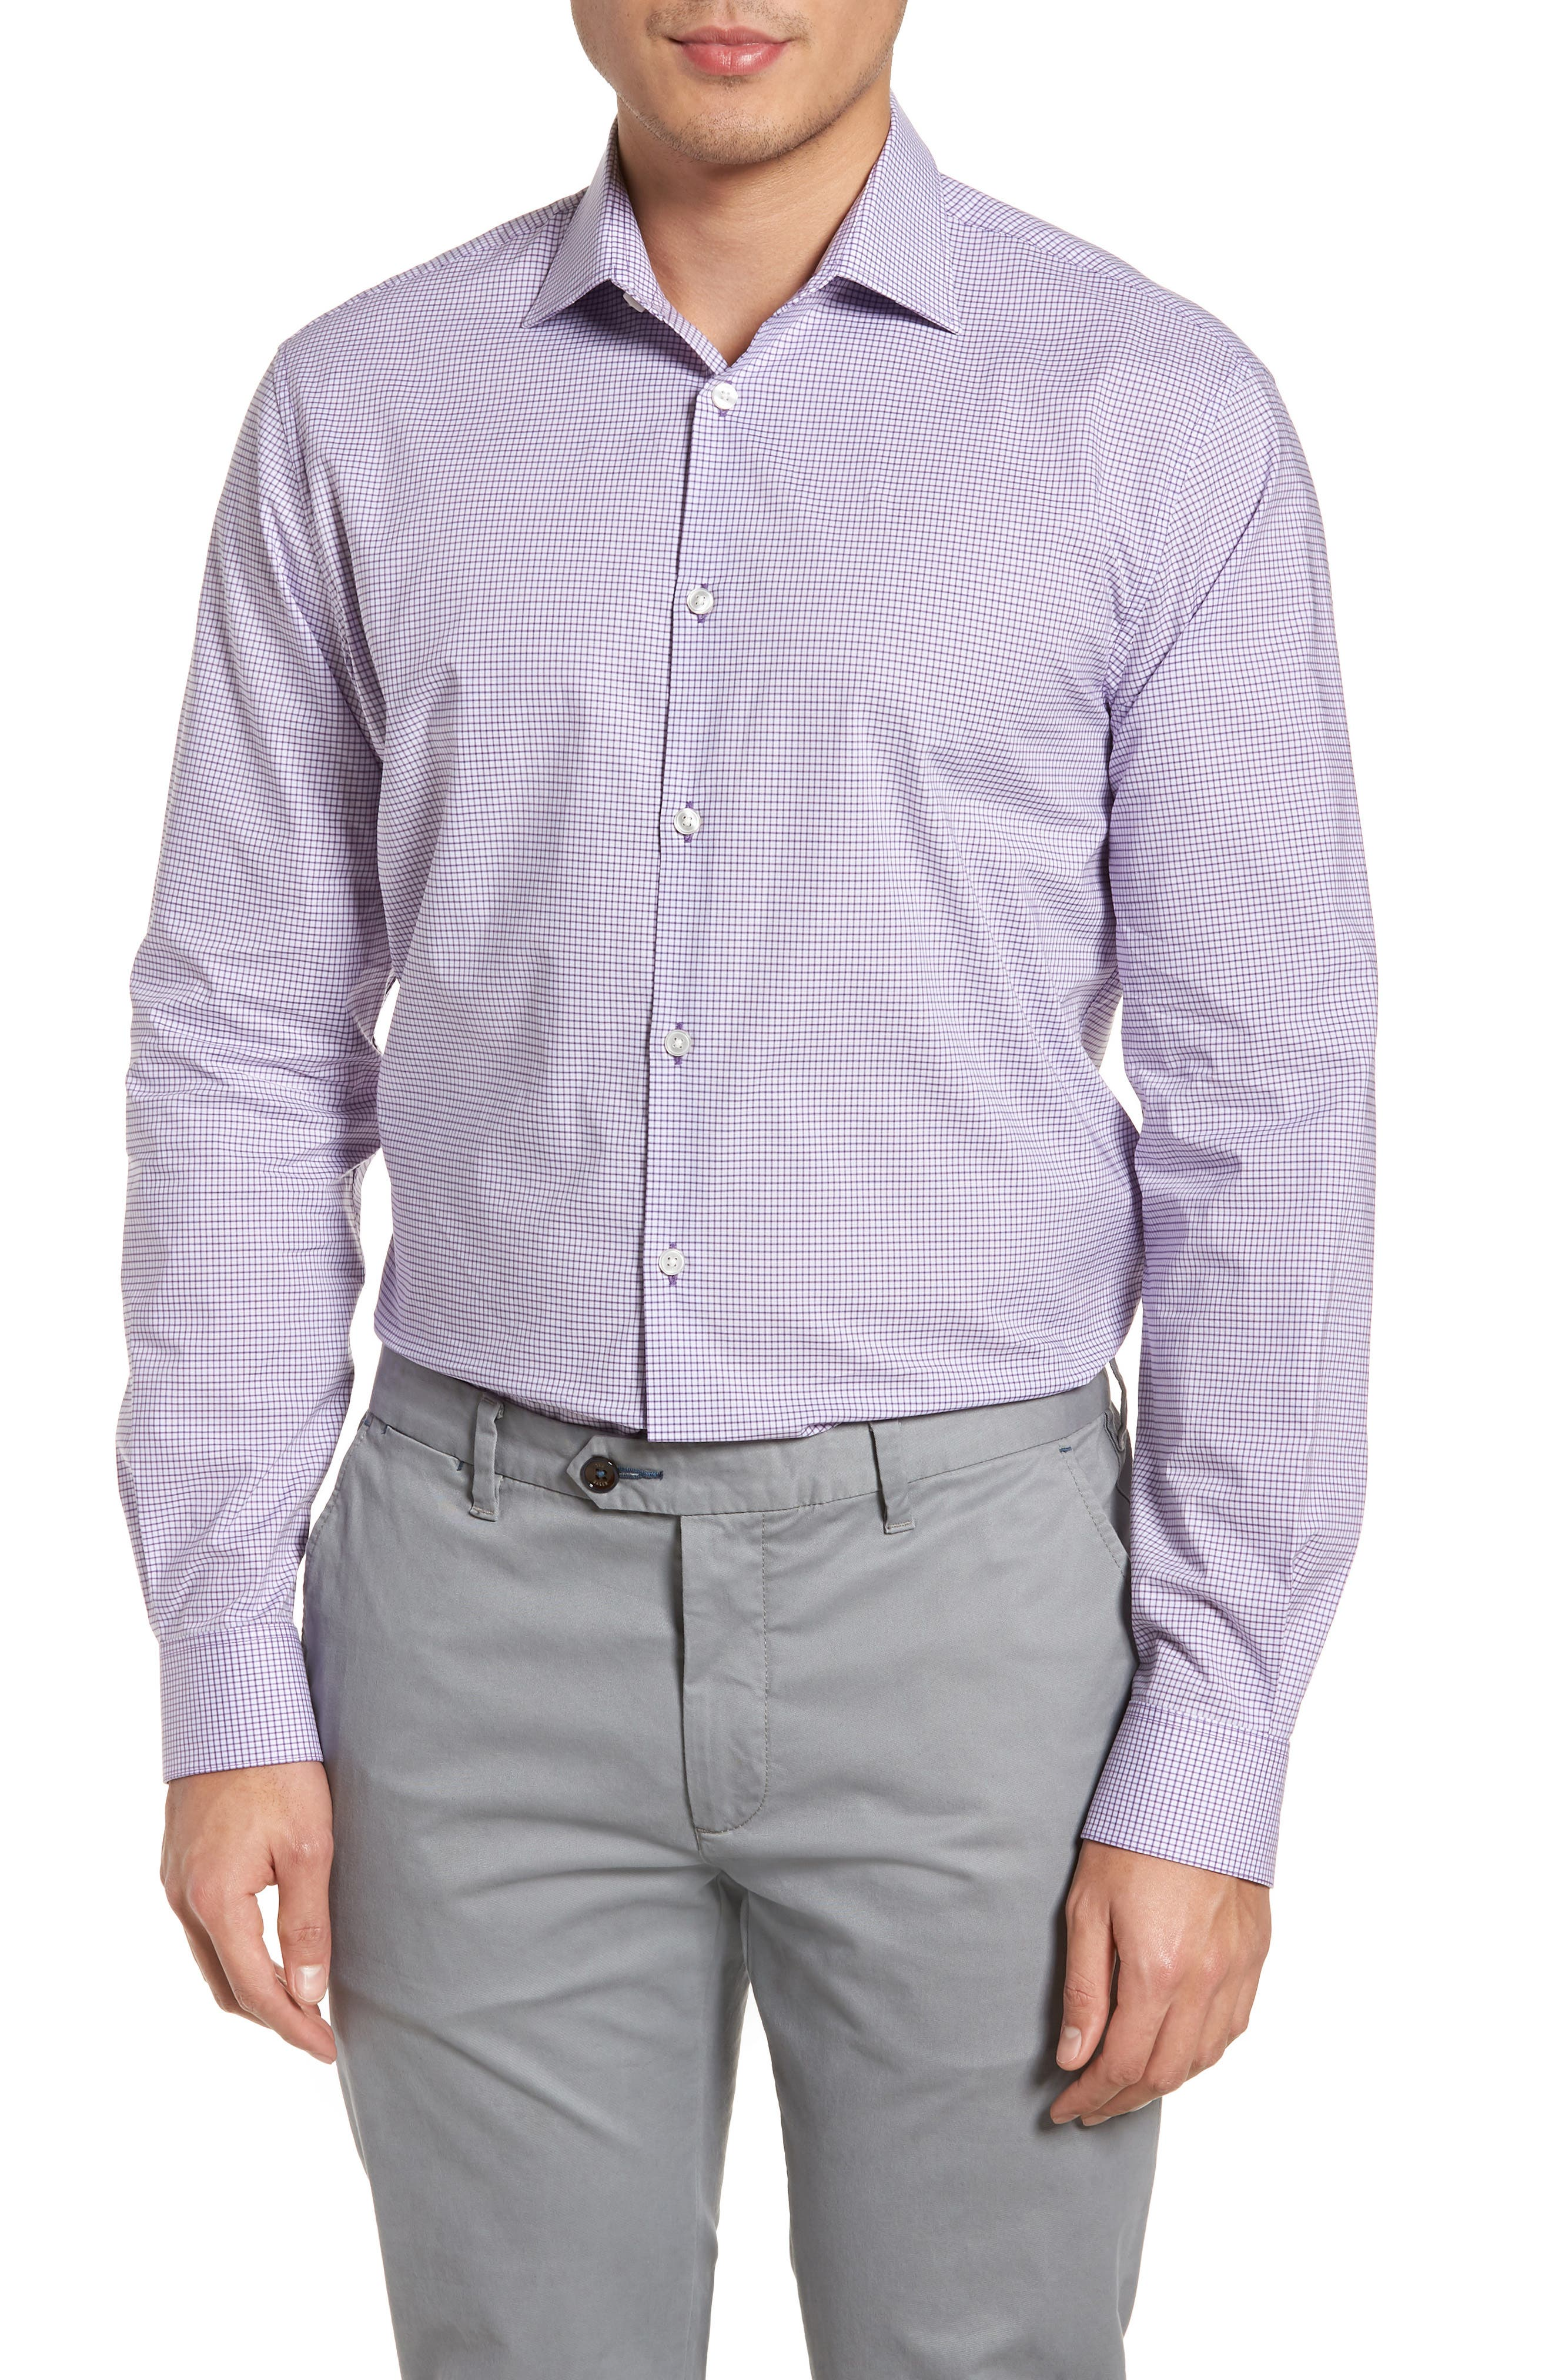 Regular Fit Stretch Check Dress Shirt,                             Main thumbnail 1, color,                             Purple